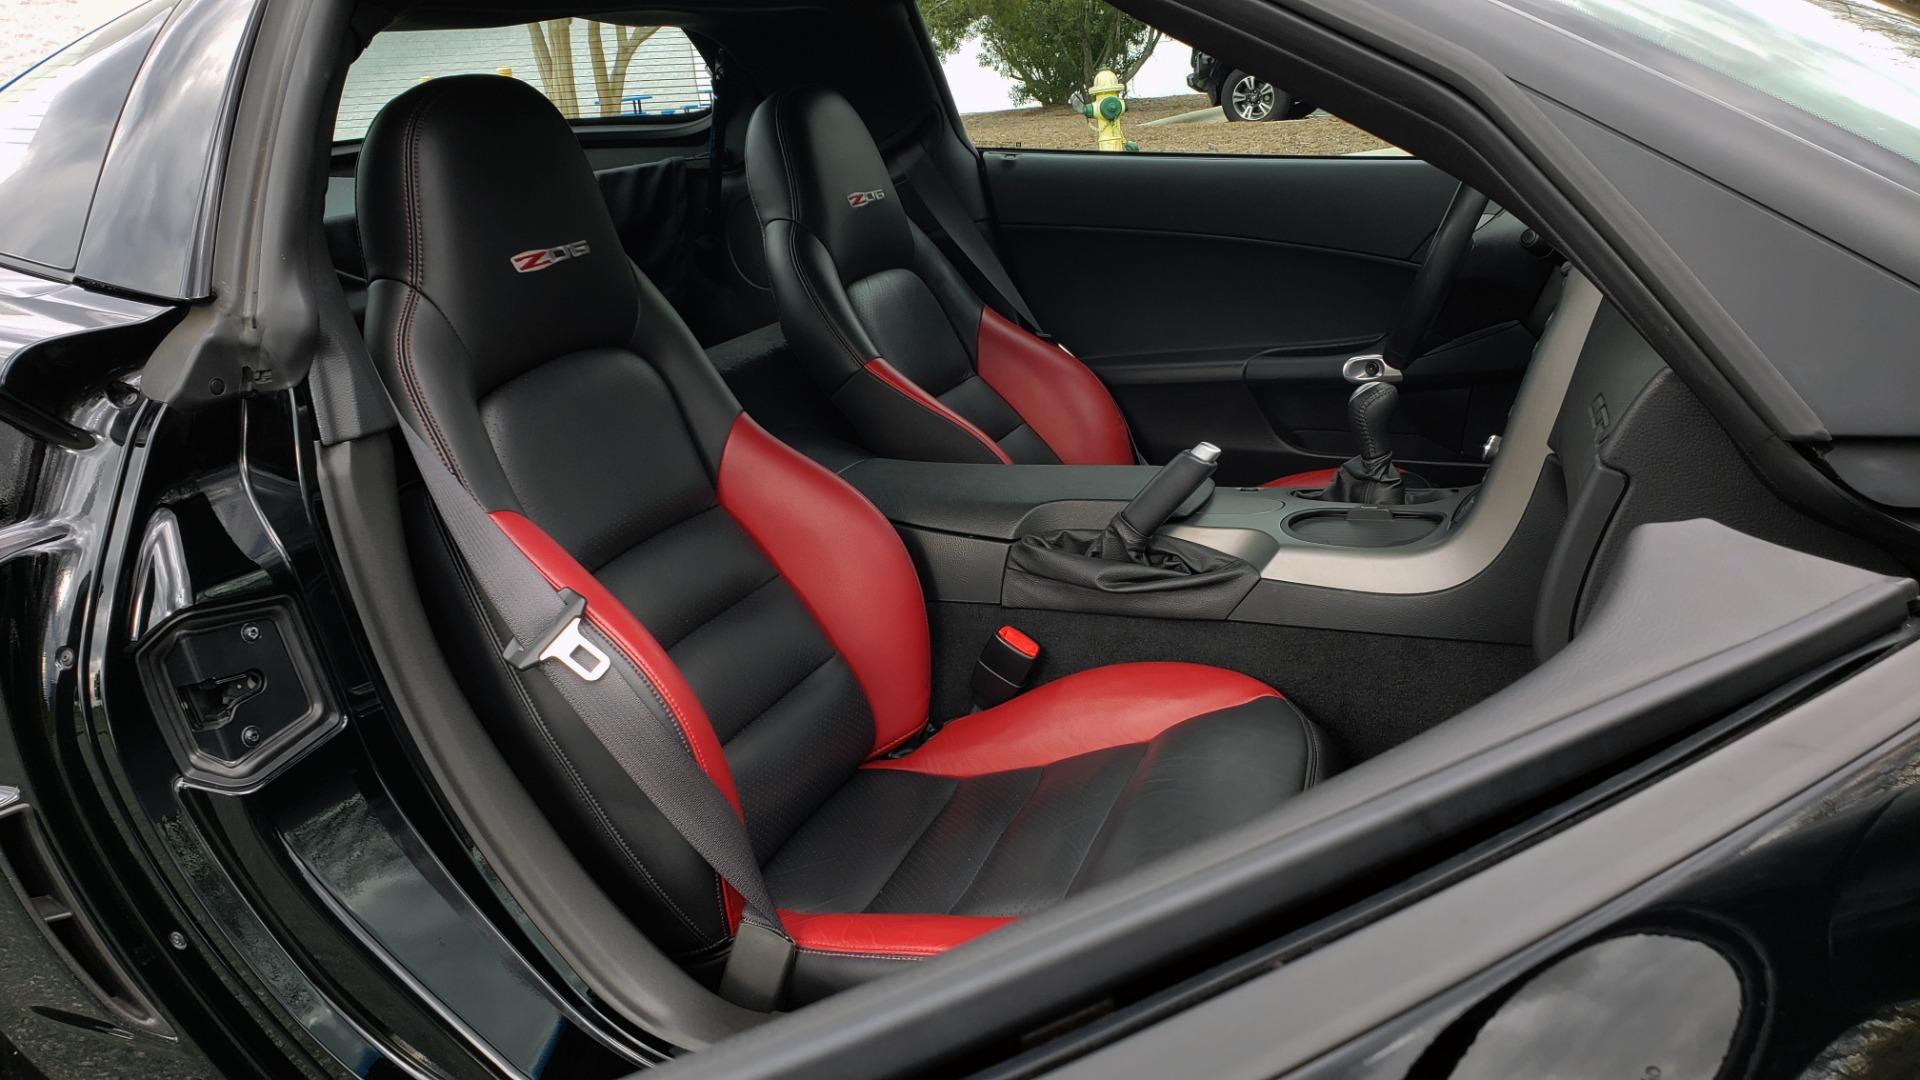 Used 2007 Chevrolet CORVETTE Z06 2LZ / 7.0L 427 V8 / 6-SPD MAN / BOSE / POLISHED WHEELS for sale Sold at Formula Imports in Charlotte NC 28227 84